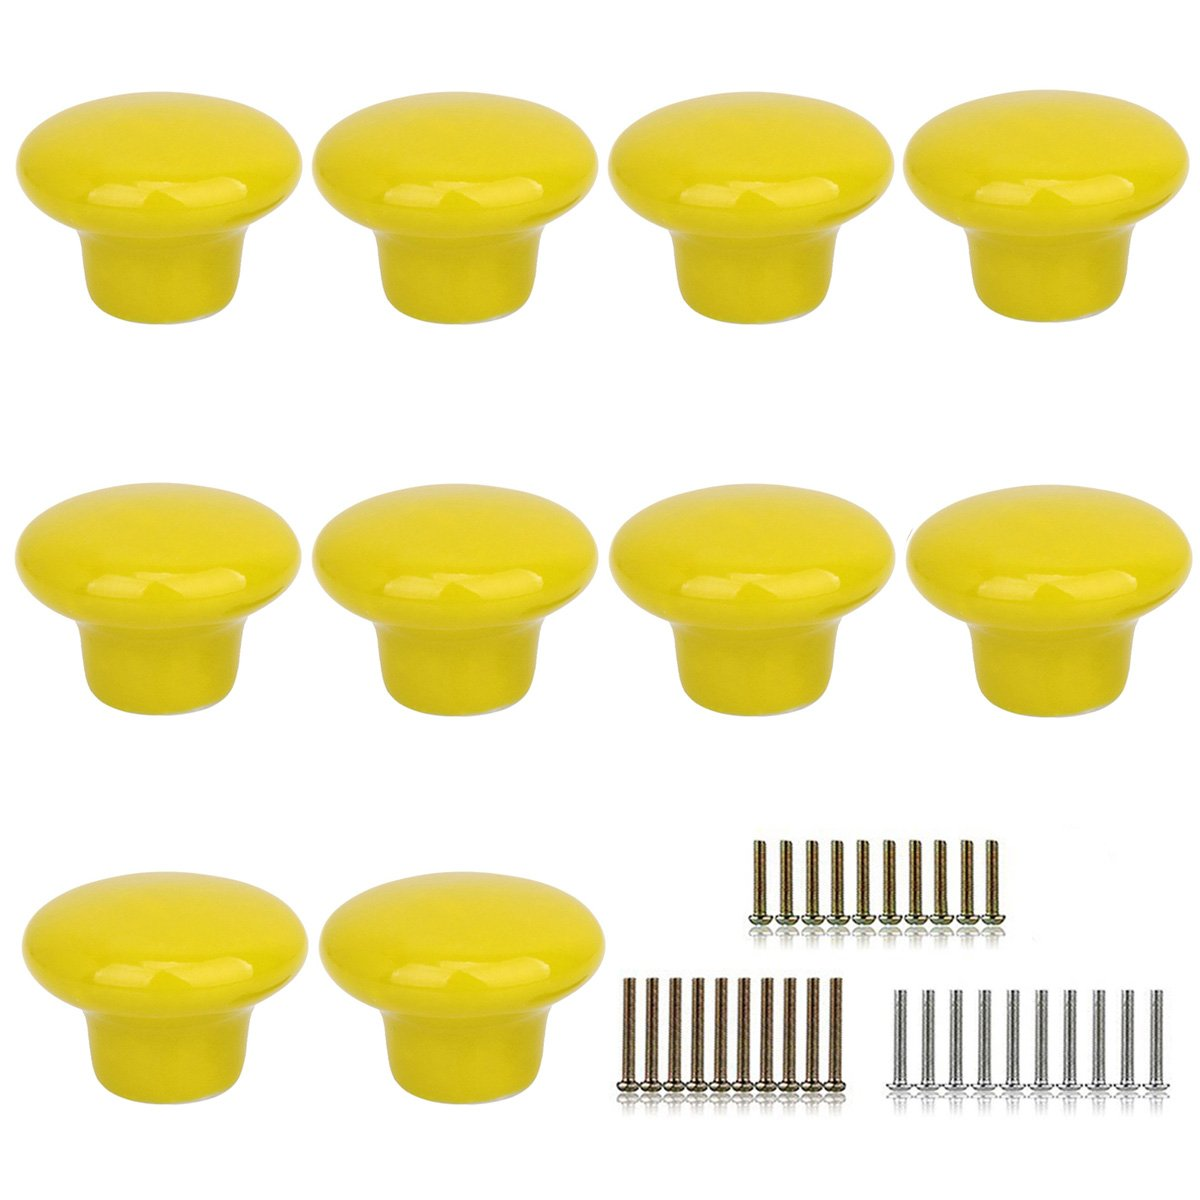 Marstree 10pcs Vintage Ceramic Door Knobs Round Shape Drawer Cupboard Locker Pulls Handles Wardrobe Drawer Cabinet Home Kitchen Hardware (Yellow)